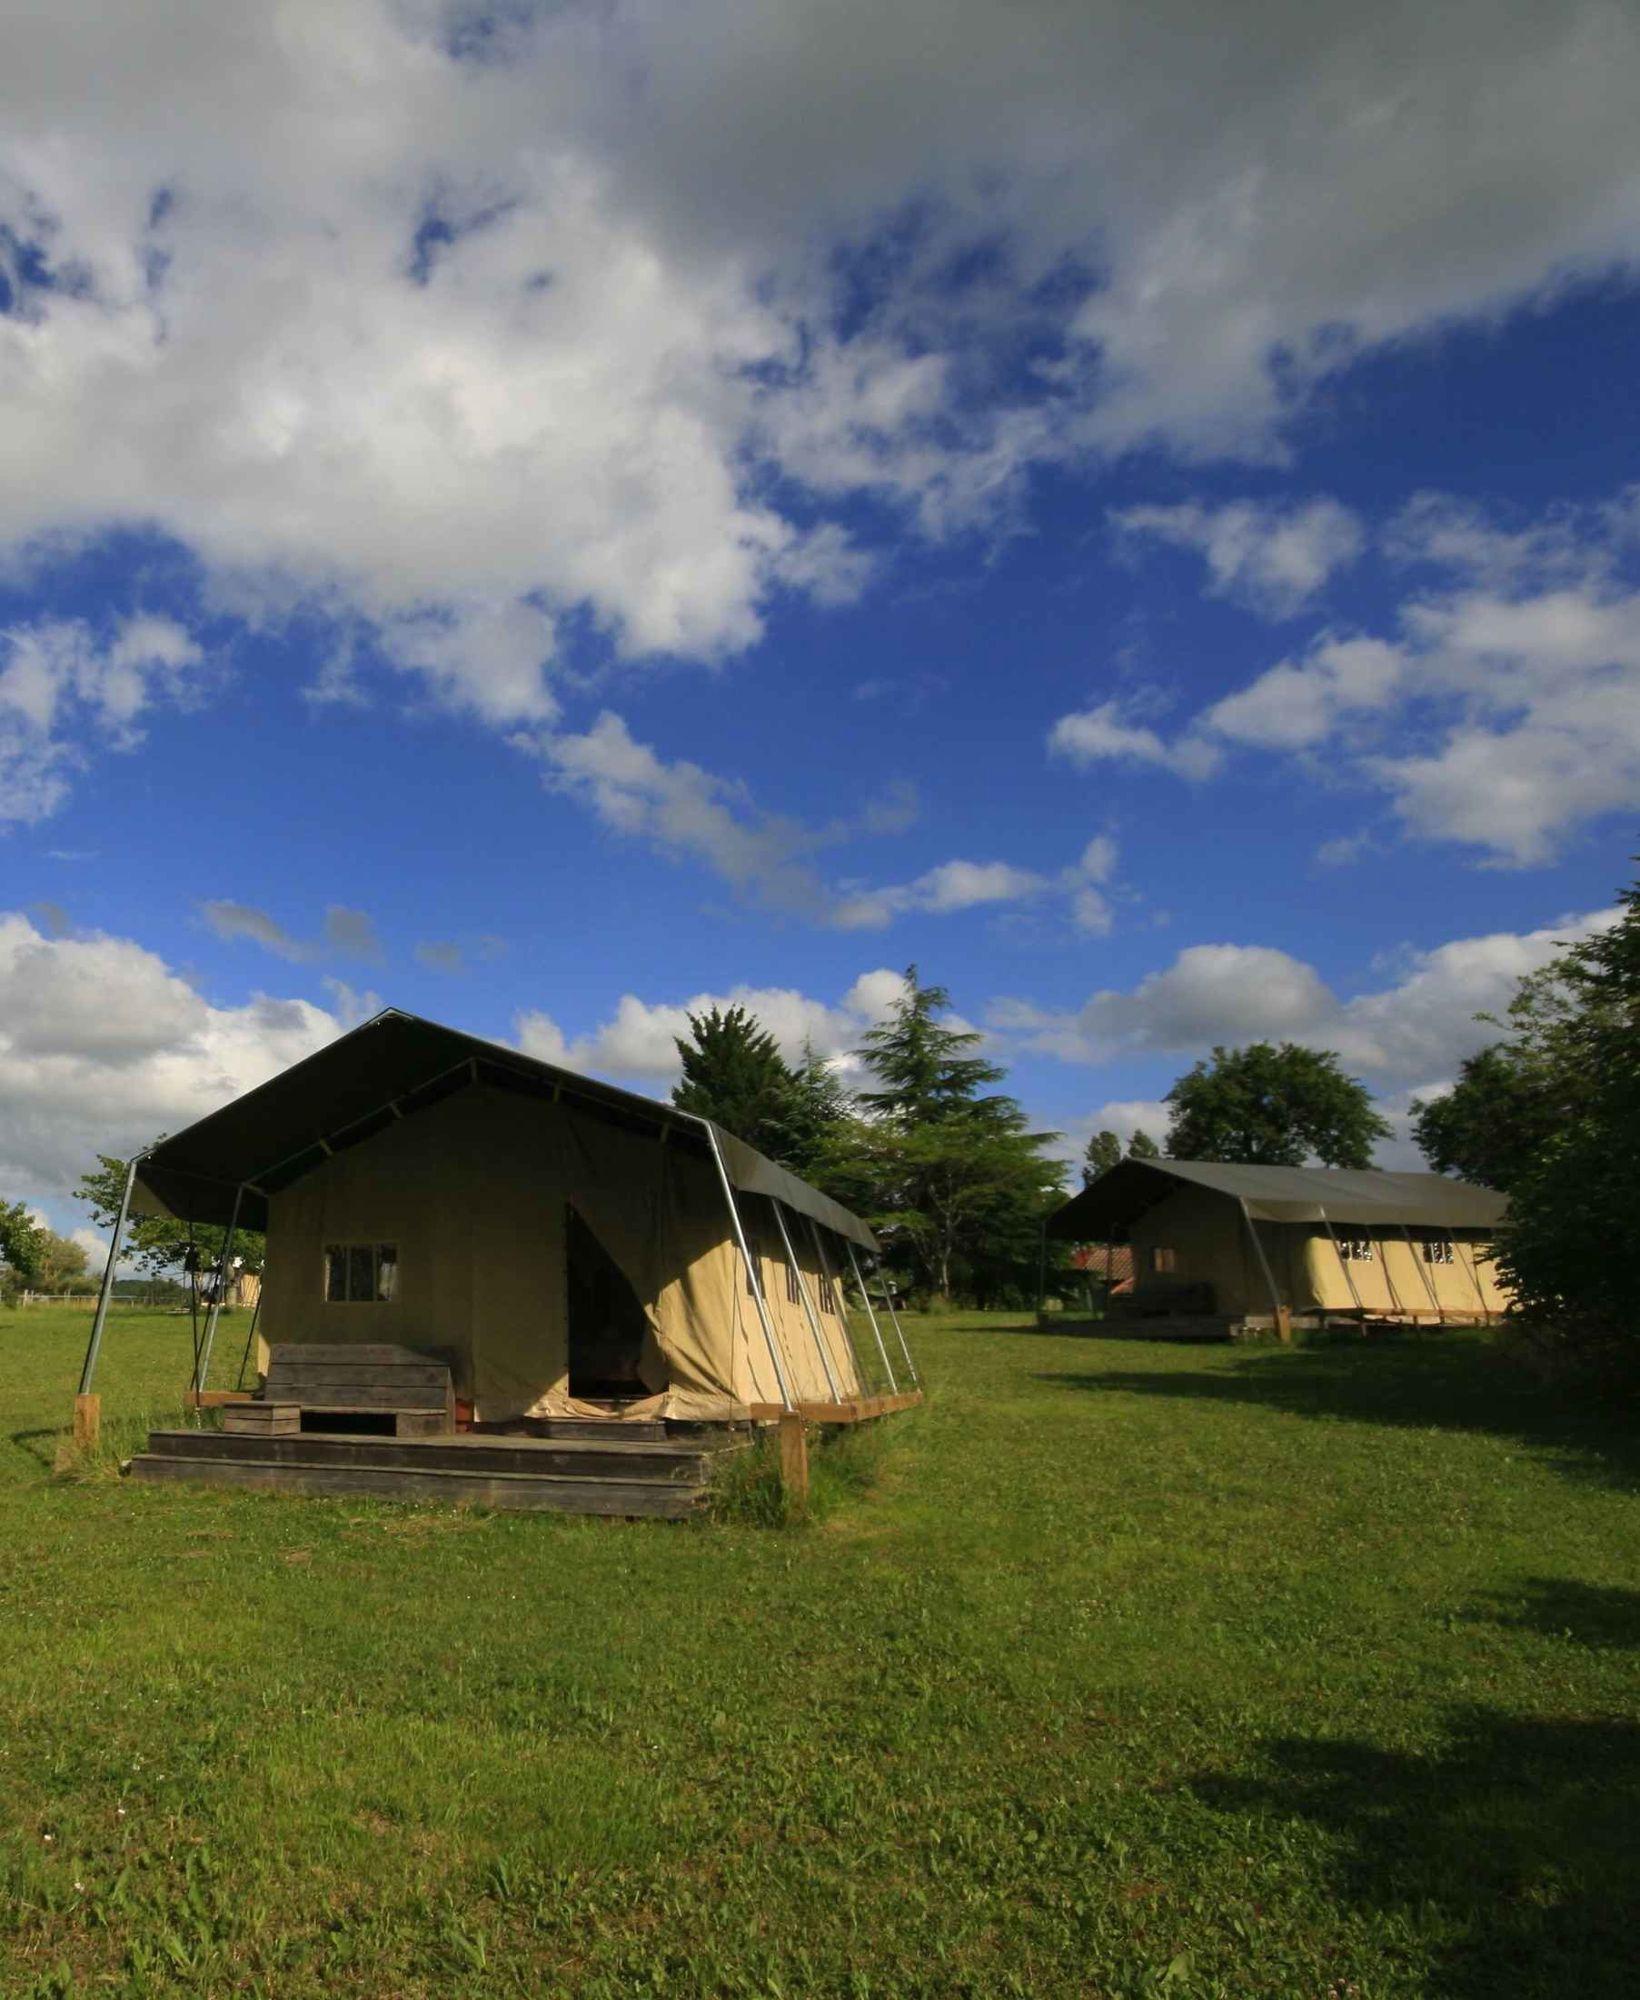 Safari Tent Glamping in France